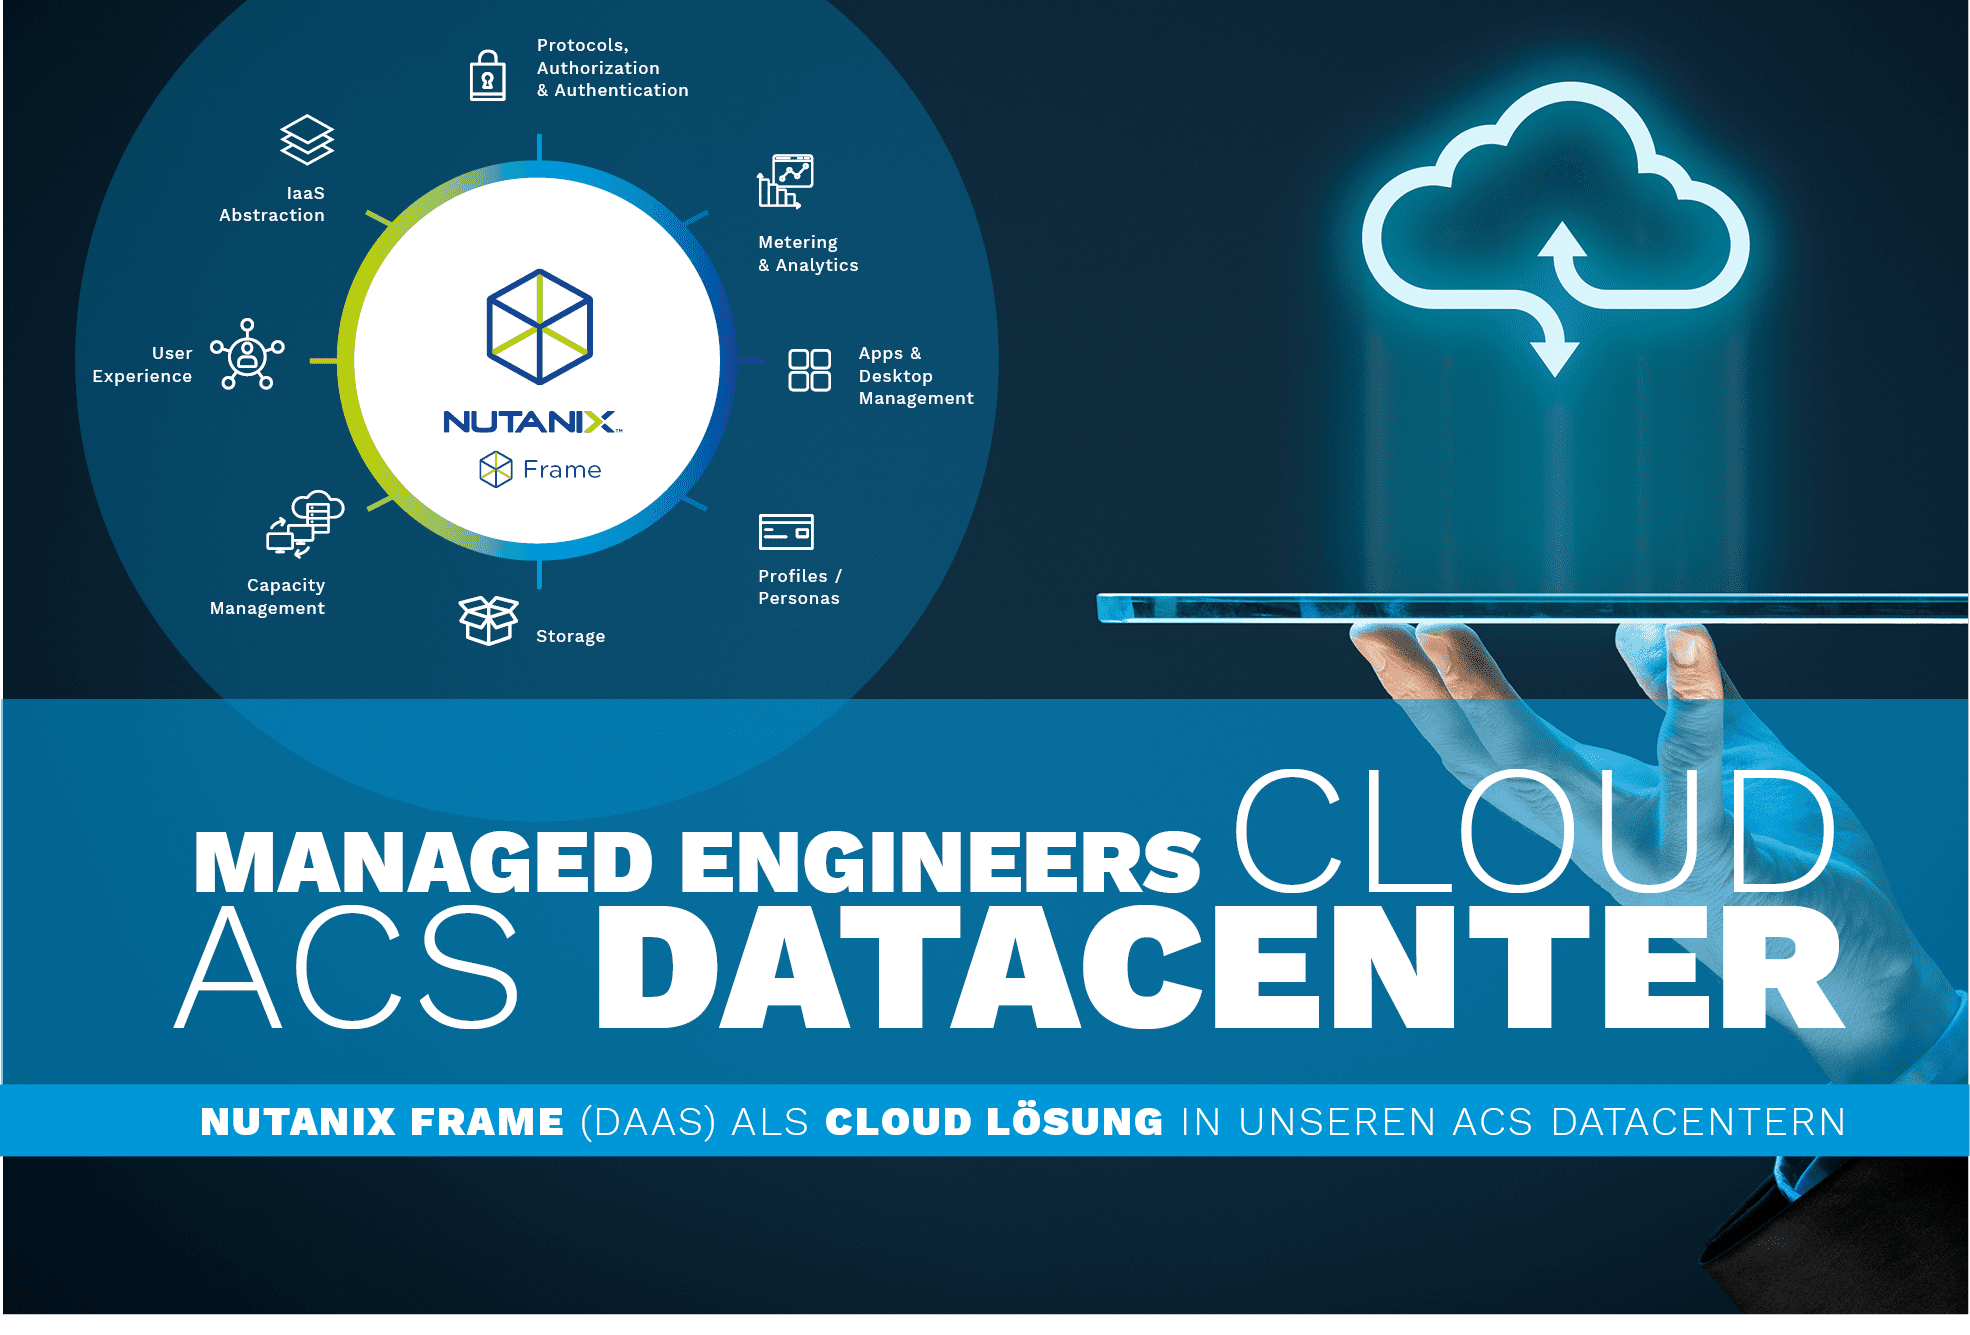 managed engineers cloud